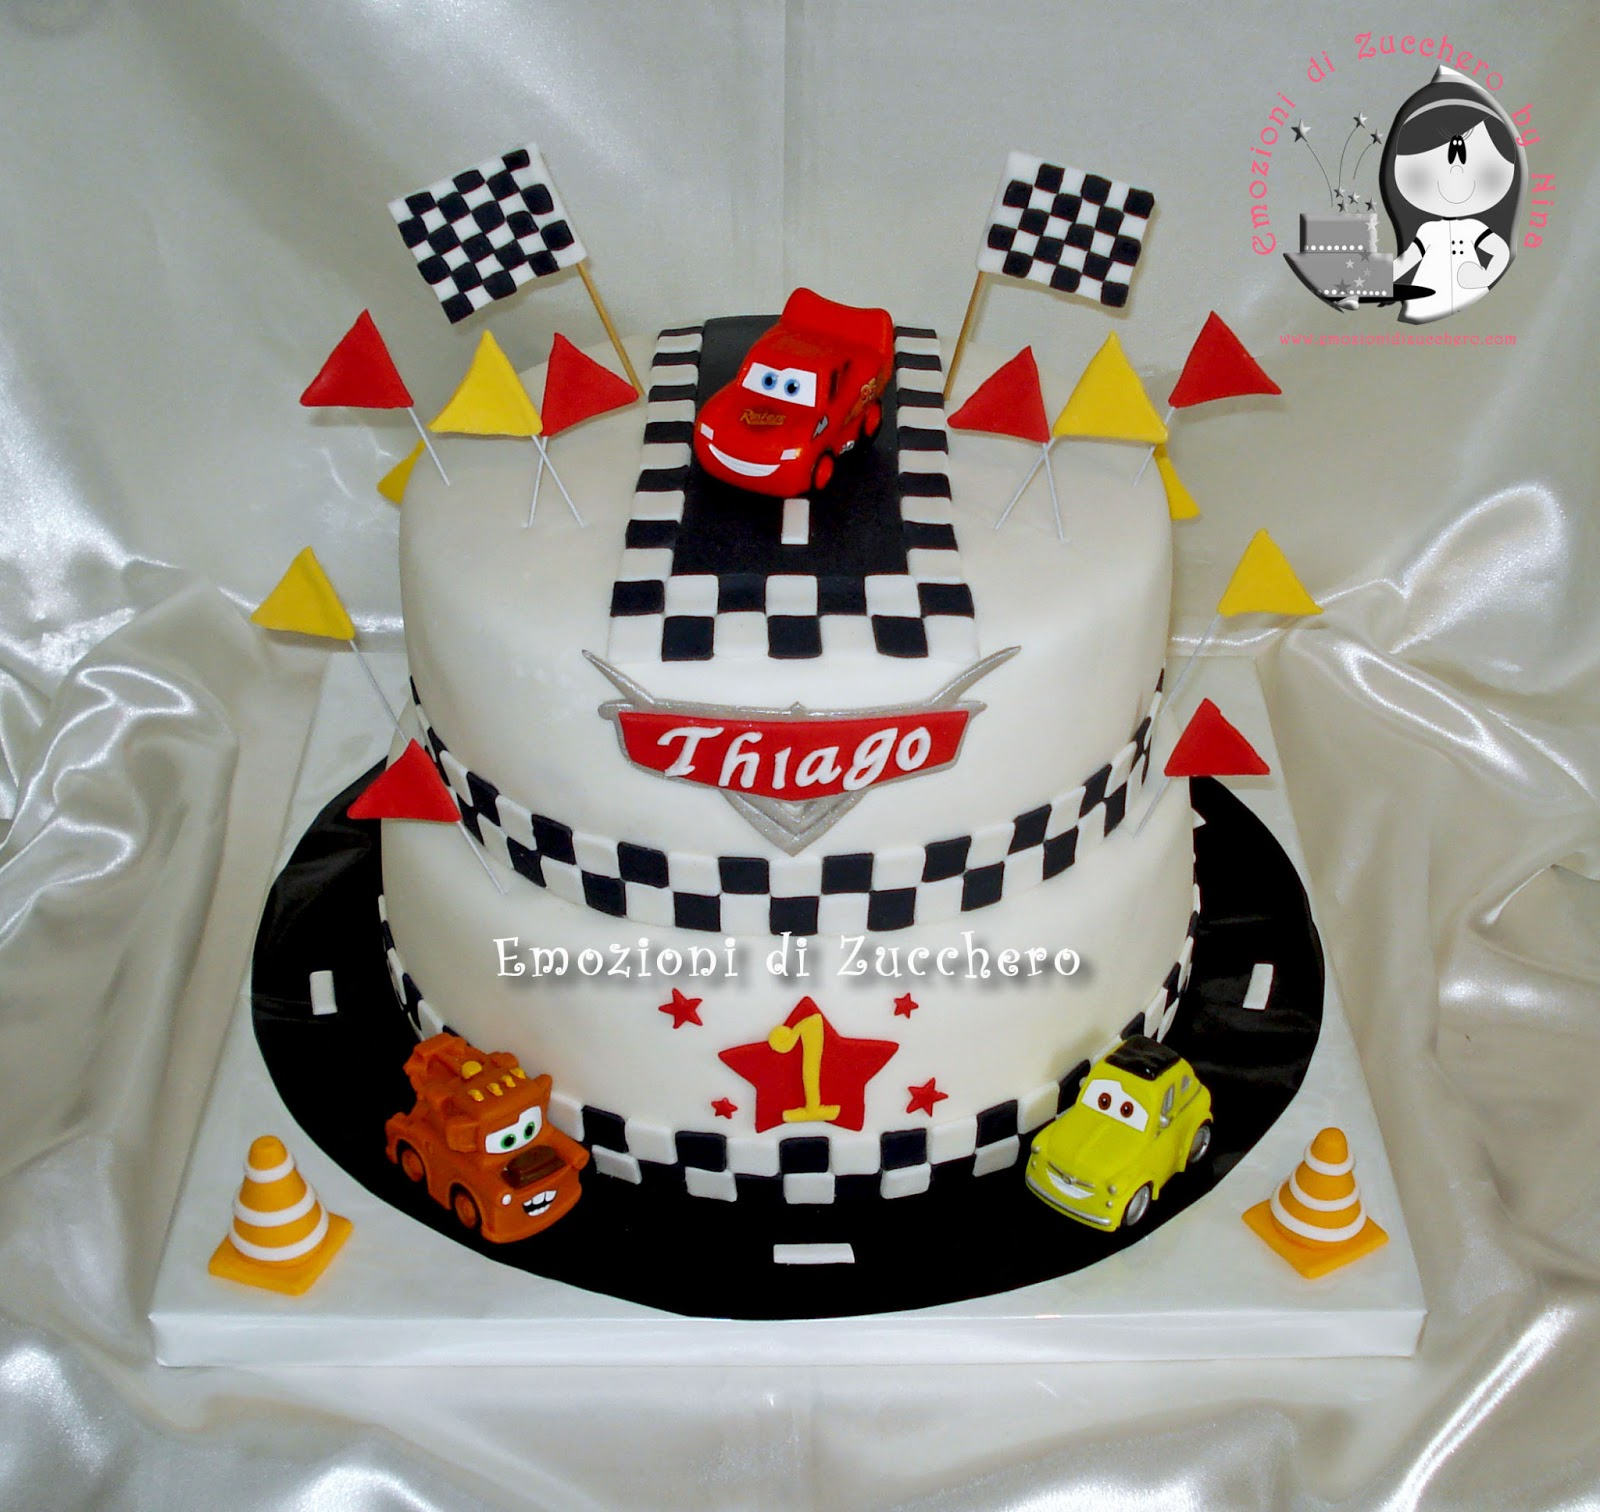 Torte Cake Design Cars : Emozioni di Zucchero by Nina - Torte decorate con pasta di ...